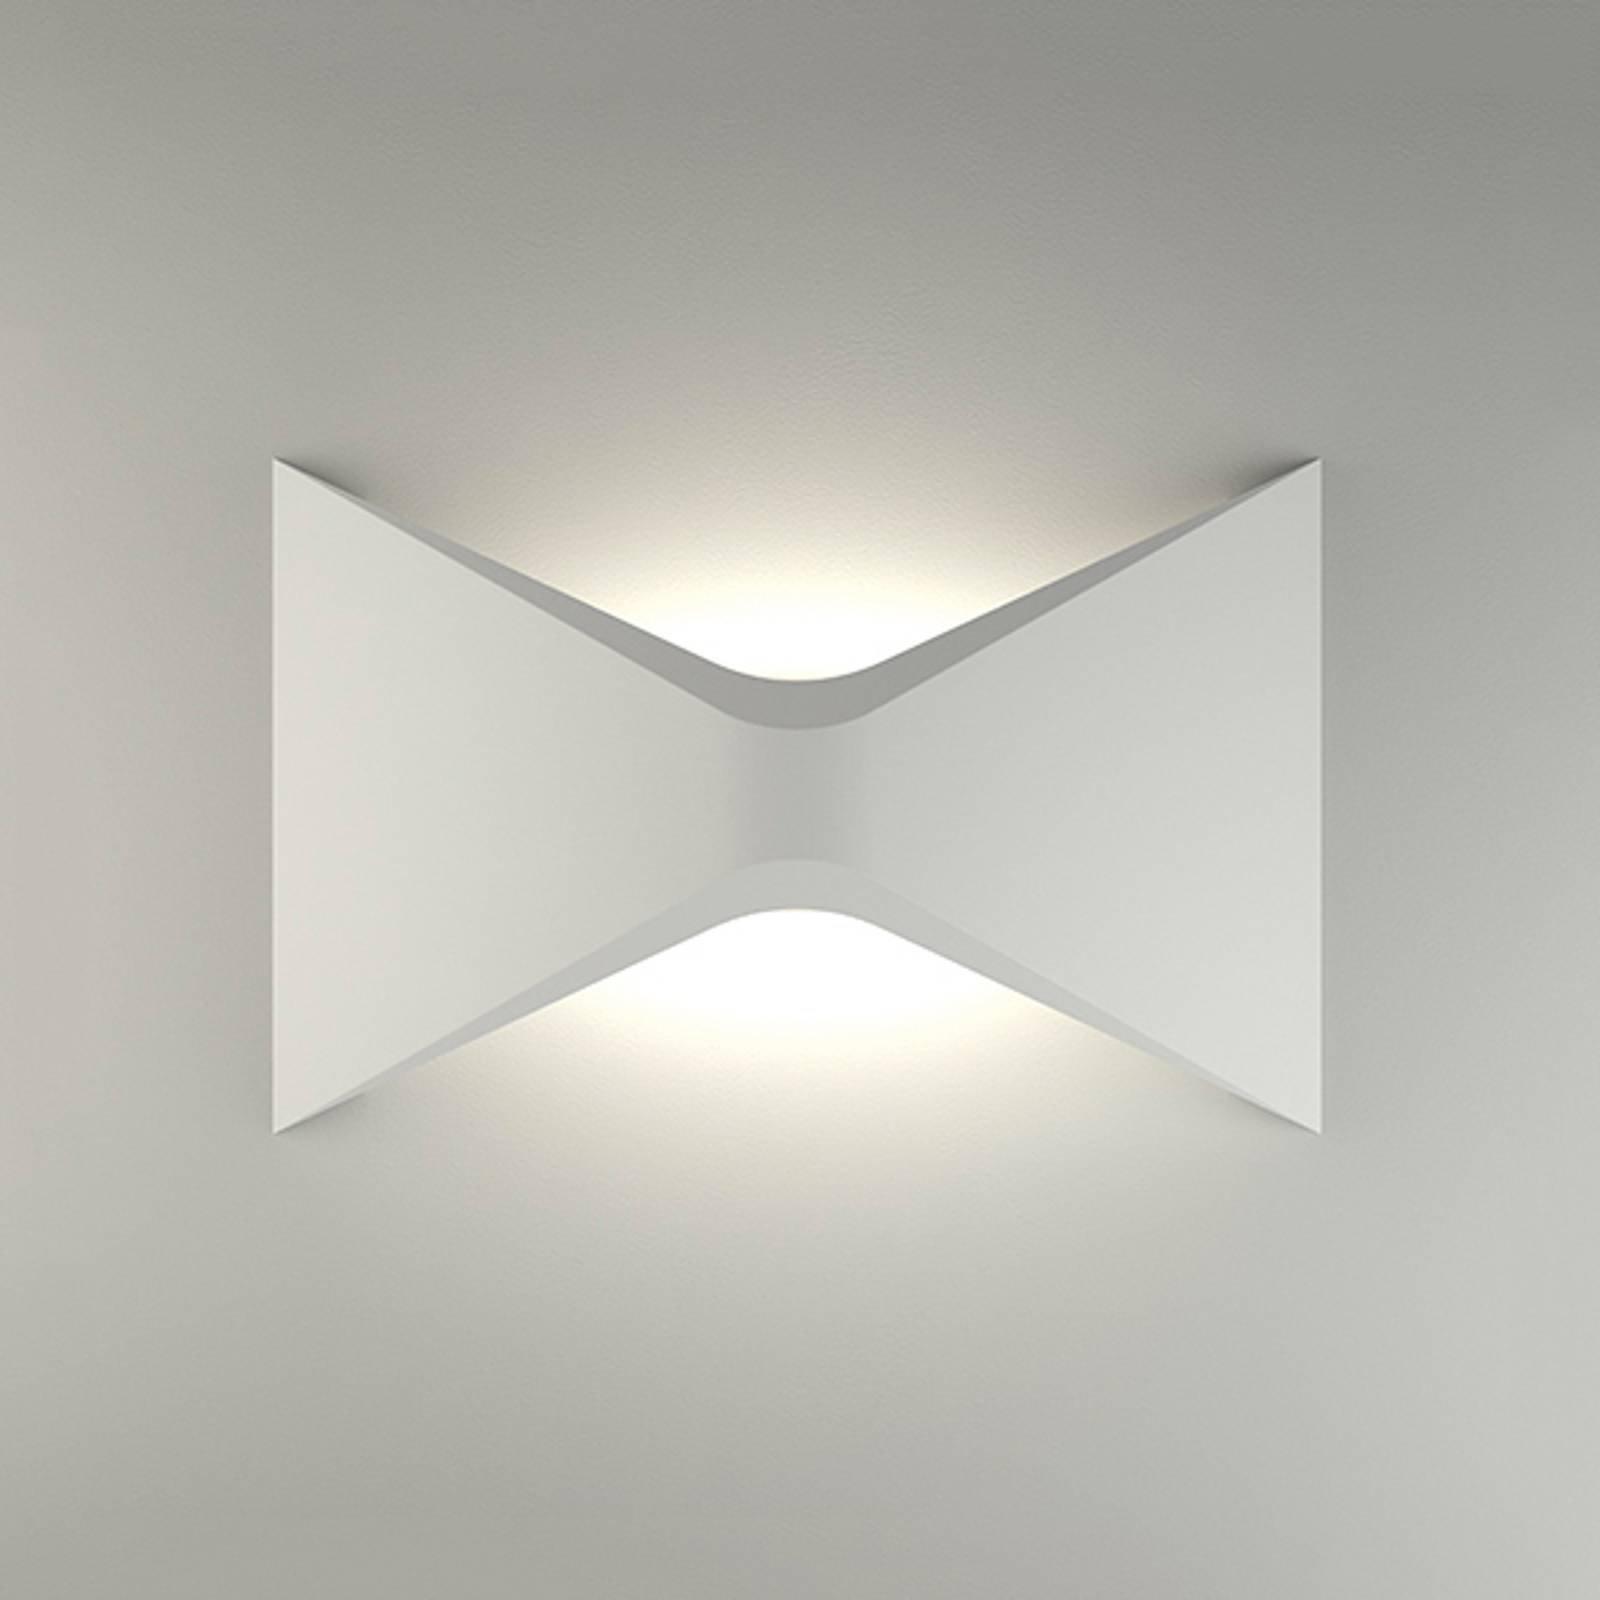 LED-vegglampe 2388, keramikk 3 000 K, ikke-dimbar